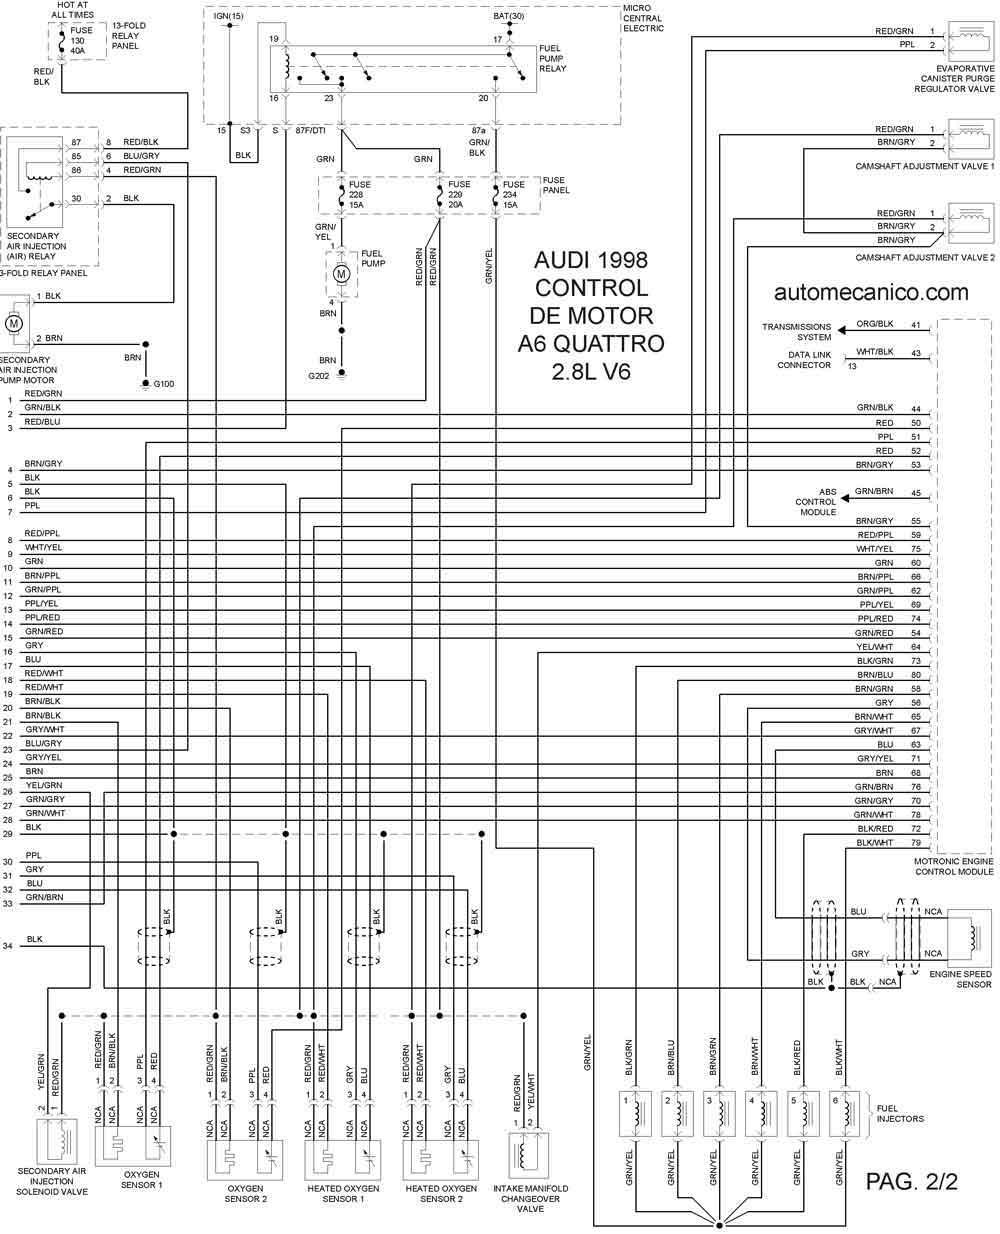 audi v8 quattro Diagrama del motor